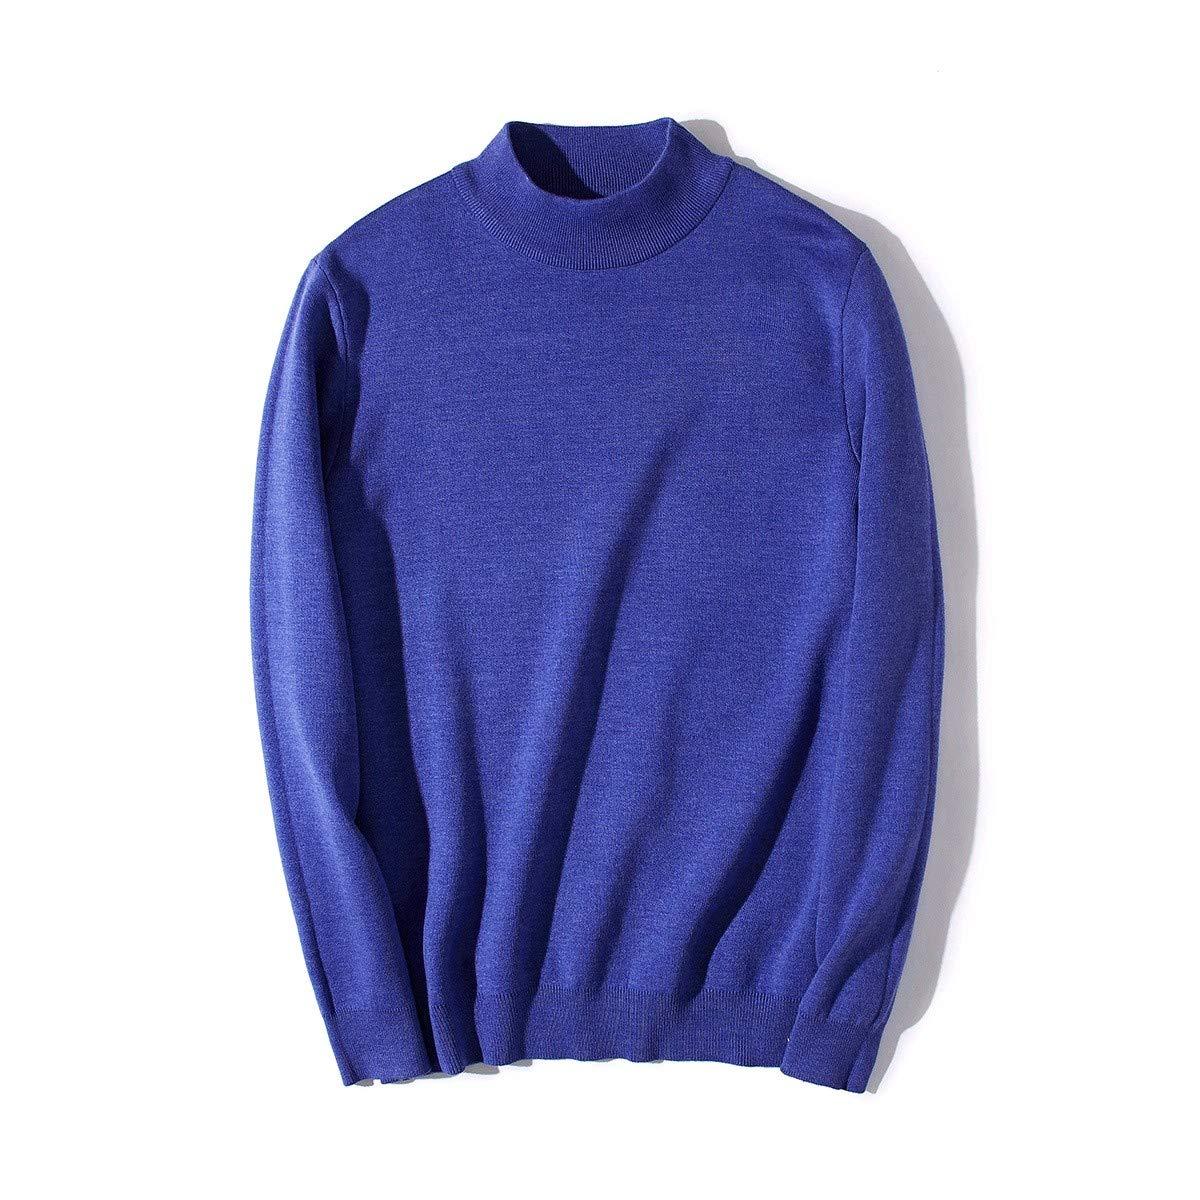 YUNY Men Turtleneck Pullover Oversize Colortone Pullover Sweater 7 S